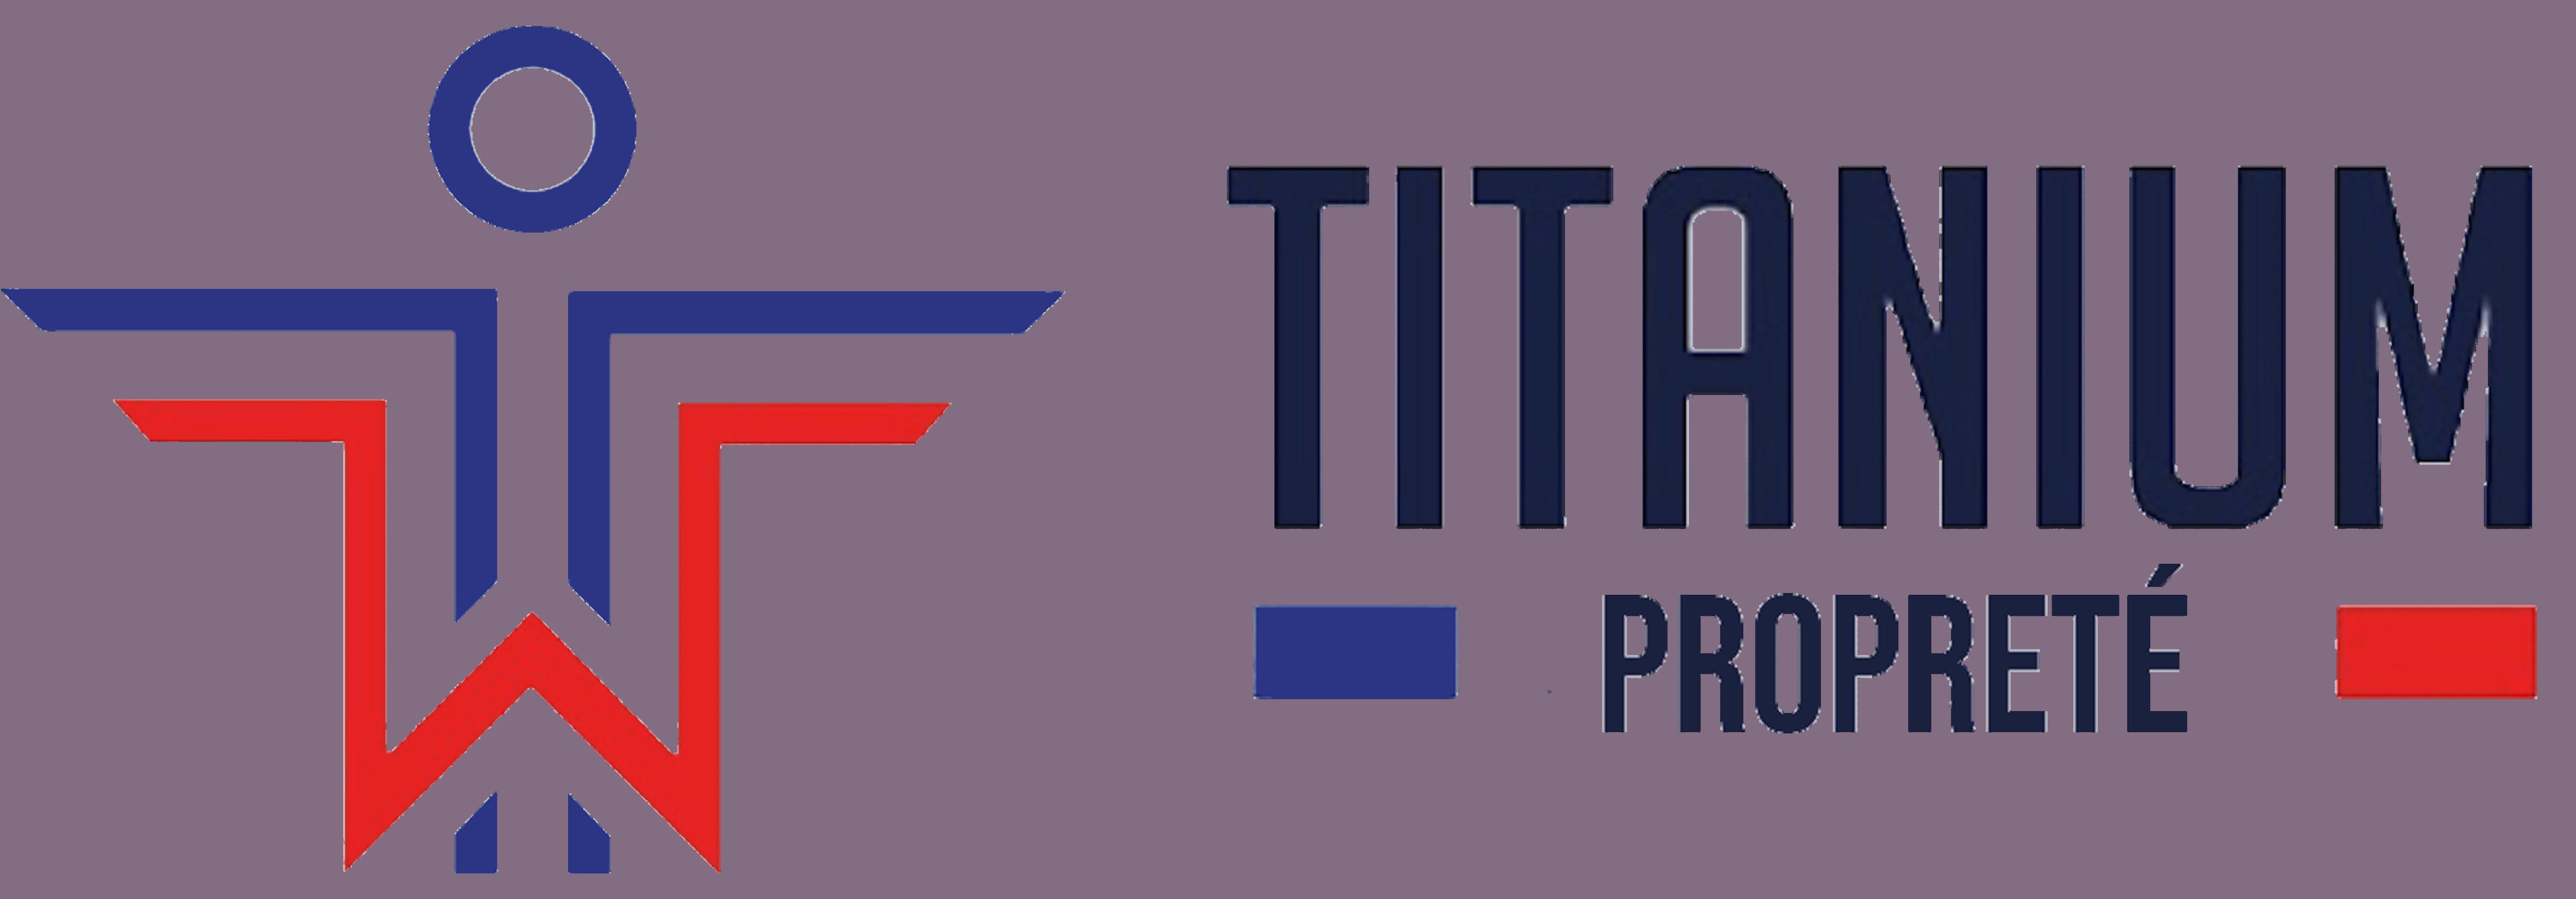 Titanium Propreté